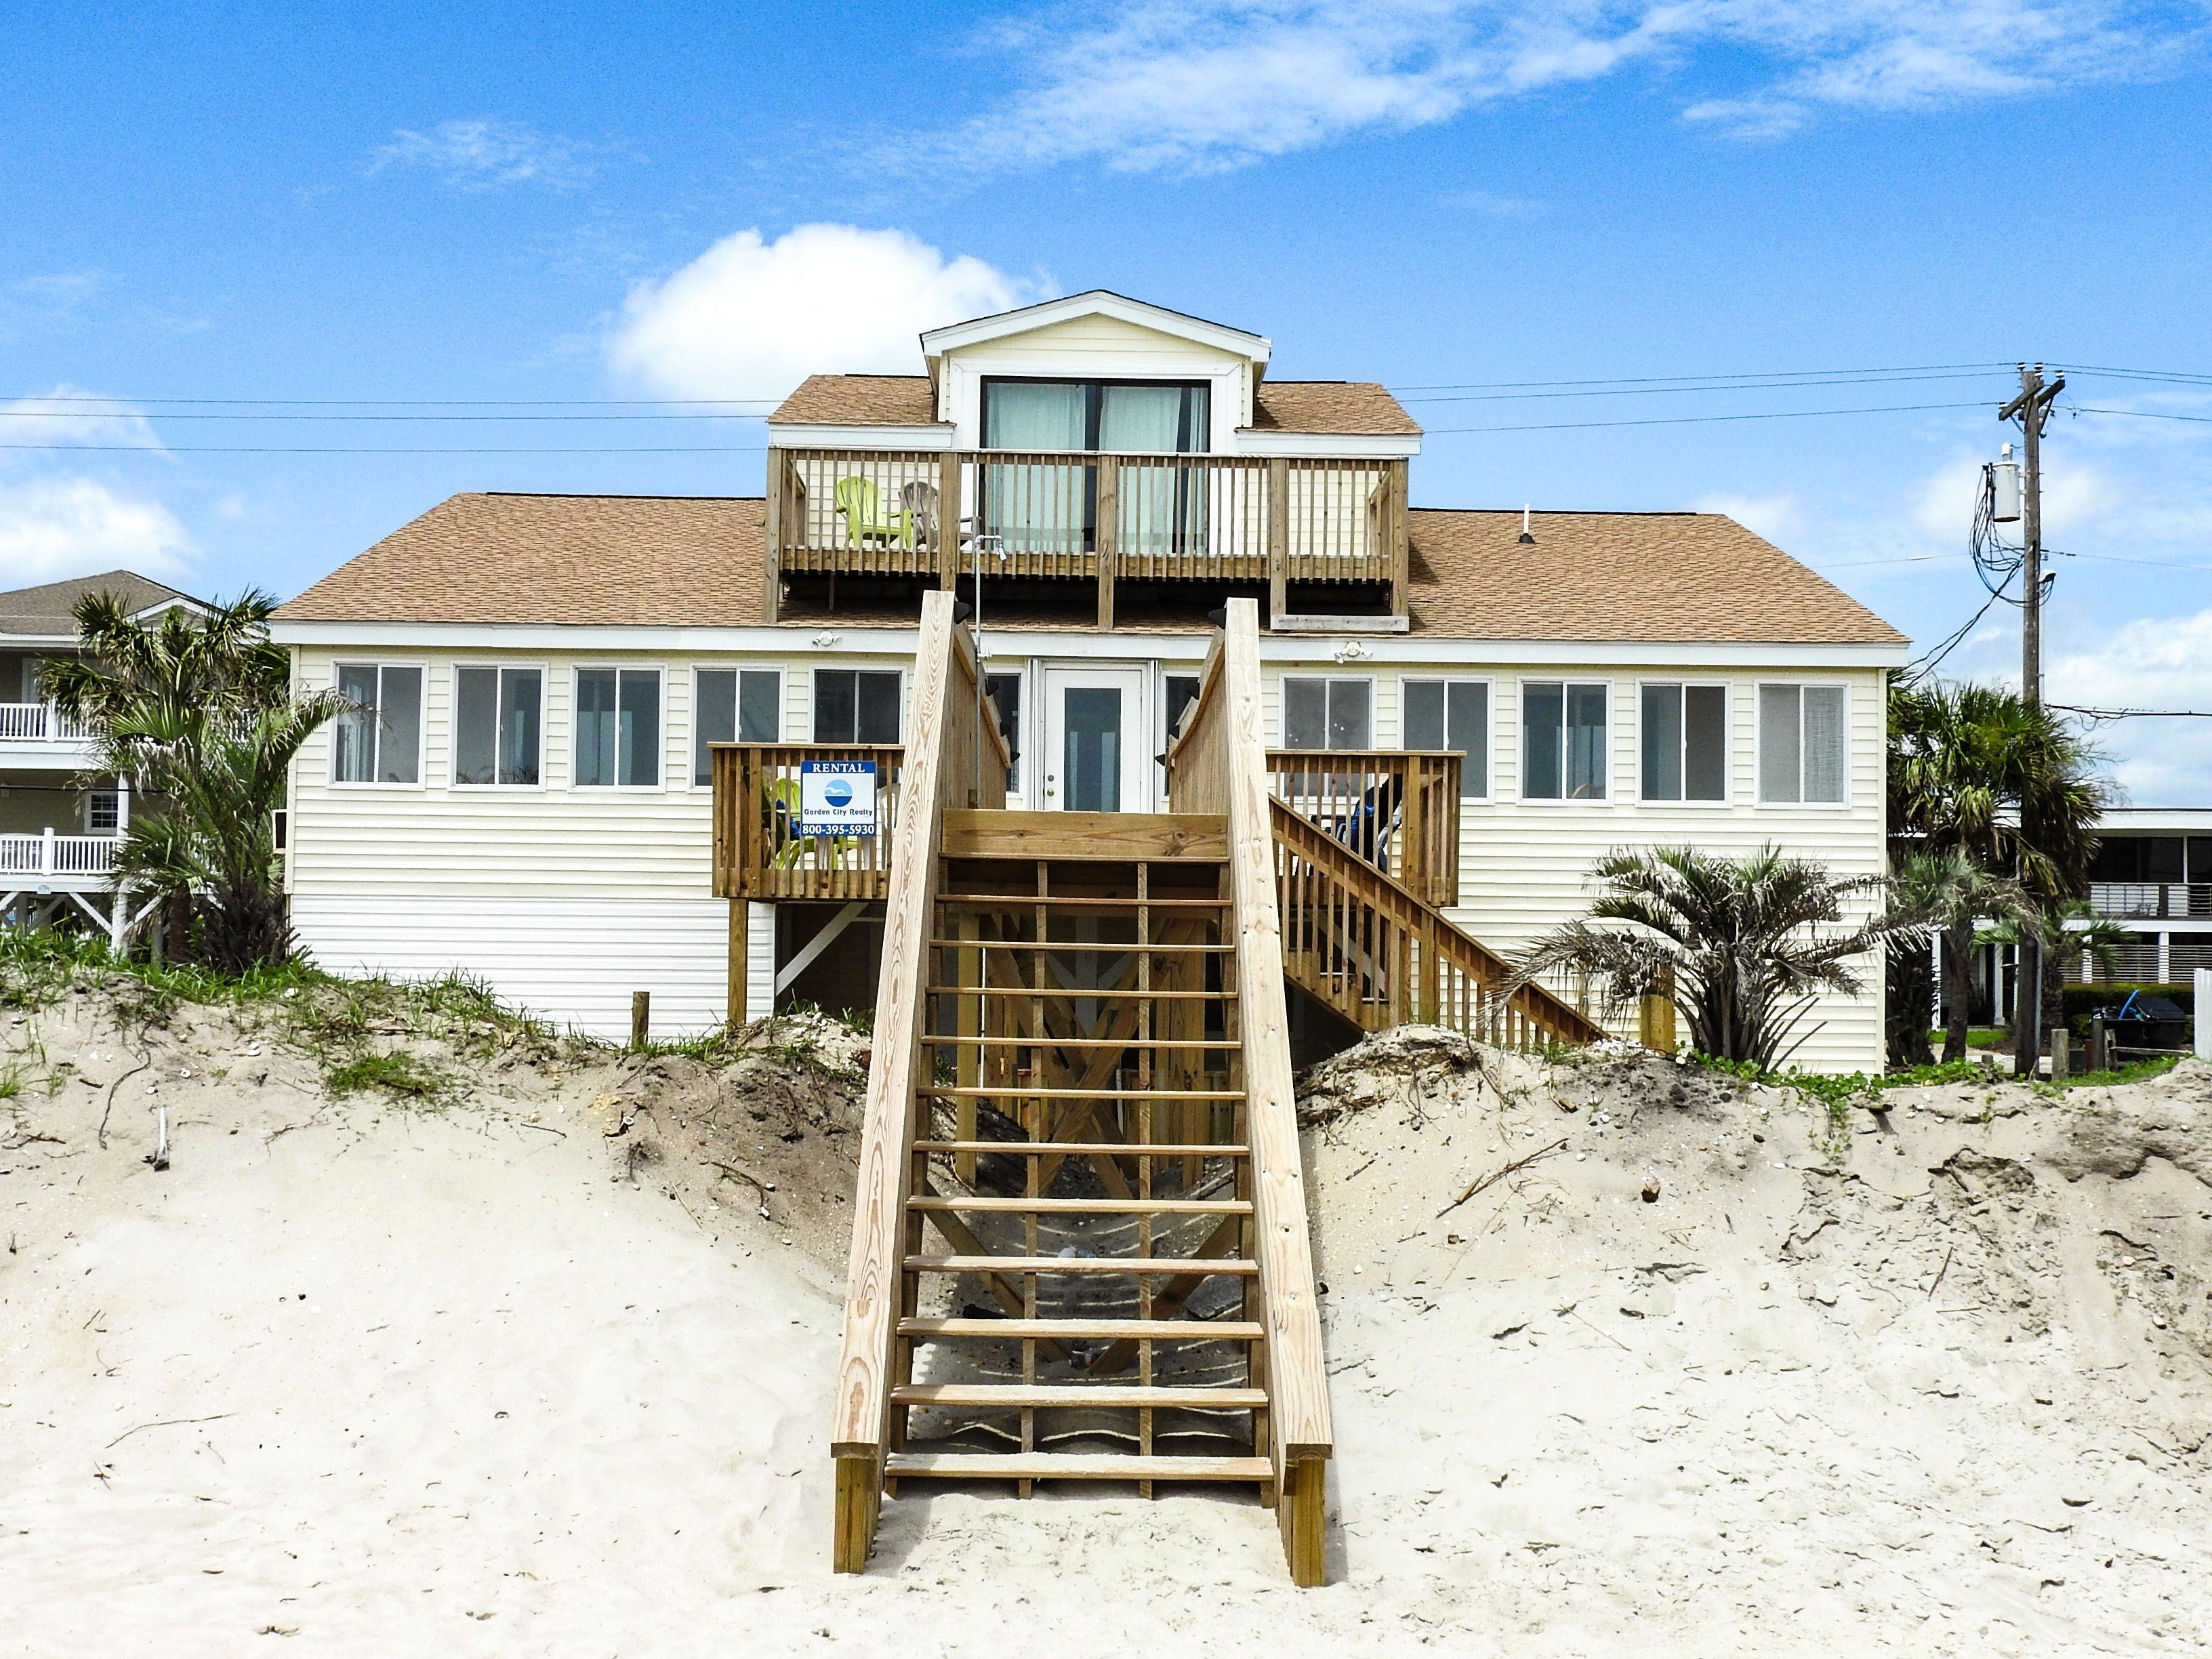 Thomas House is a sevenbedroom, fourbath oceanfront home